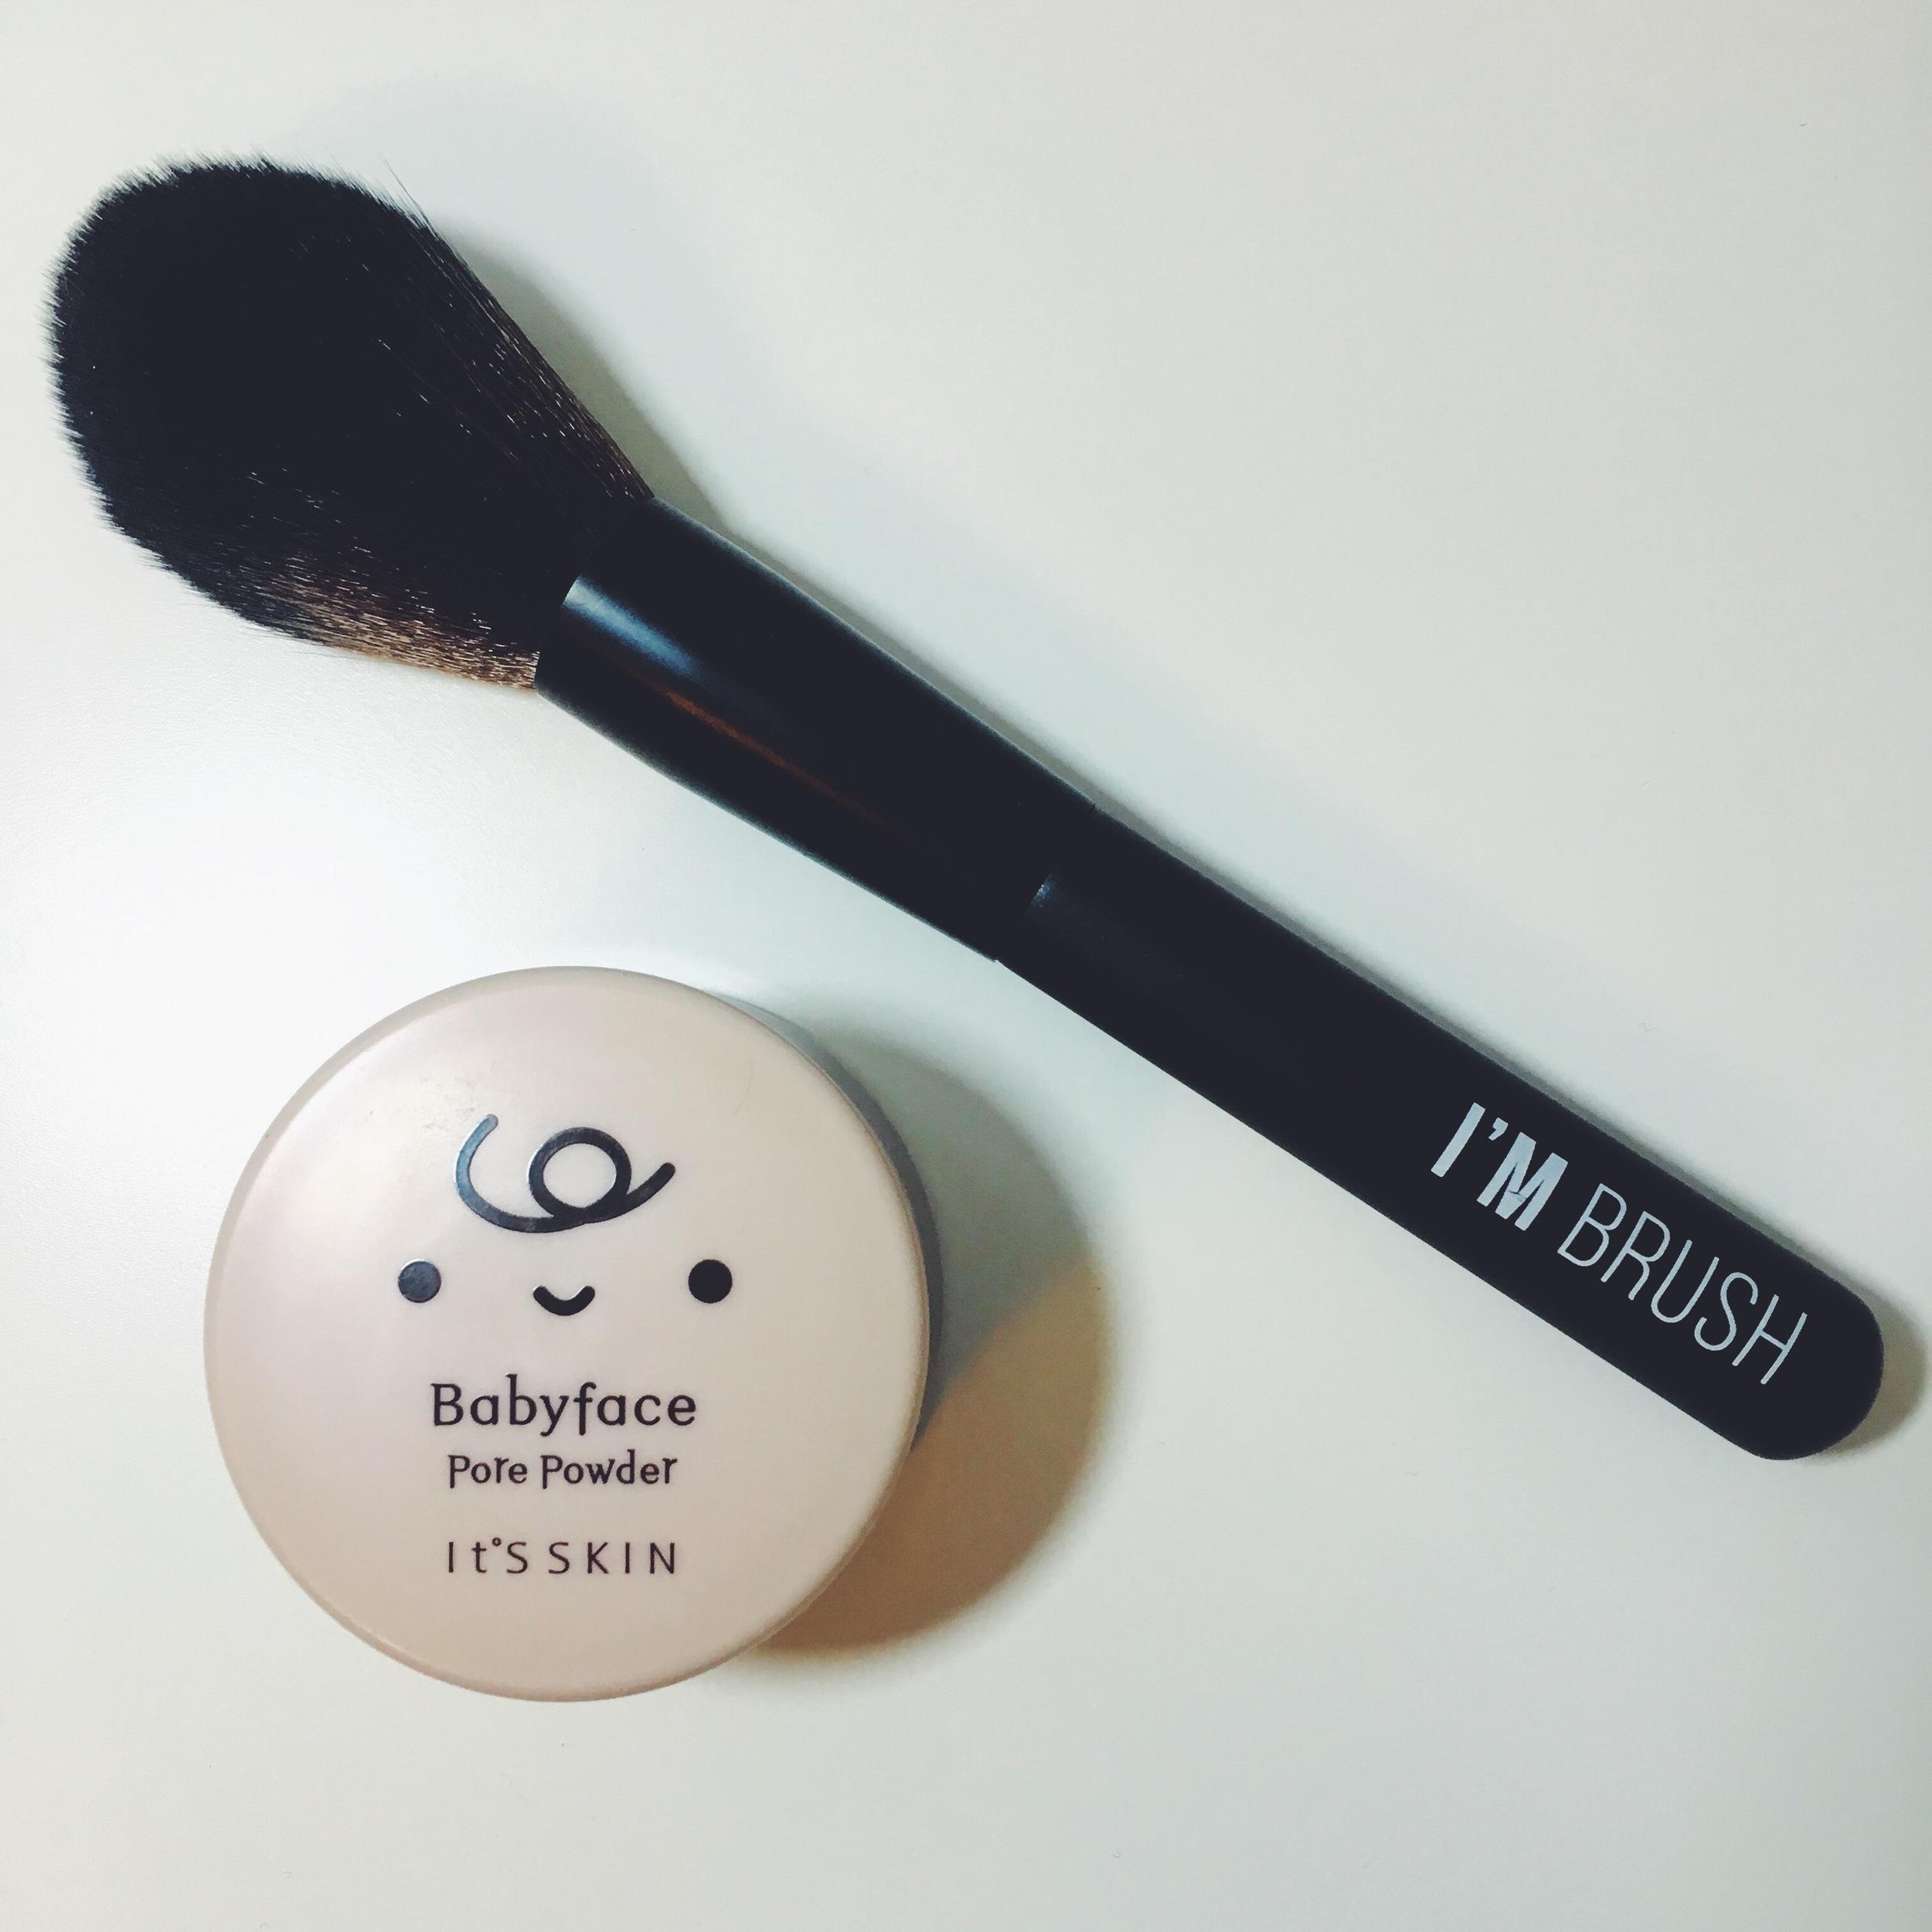 Memebox-Its-Skin-Babyface-Pore-Powder.jpg